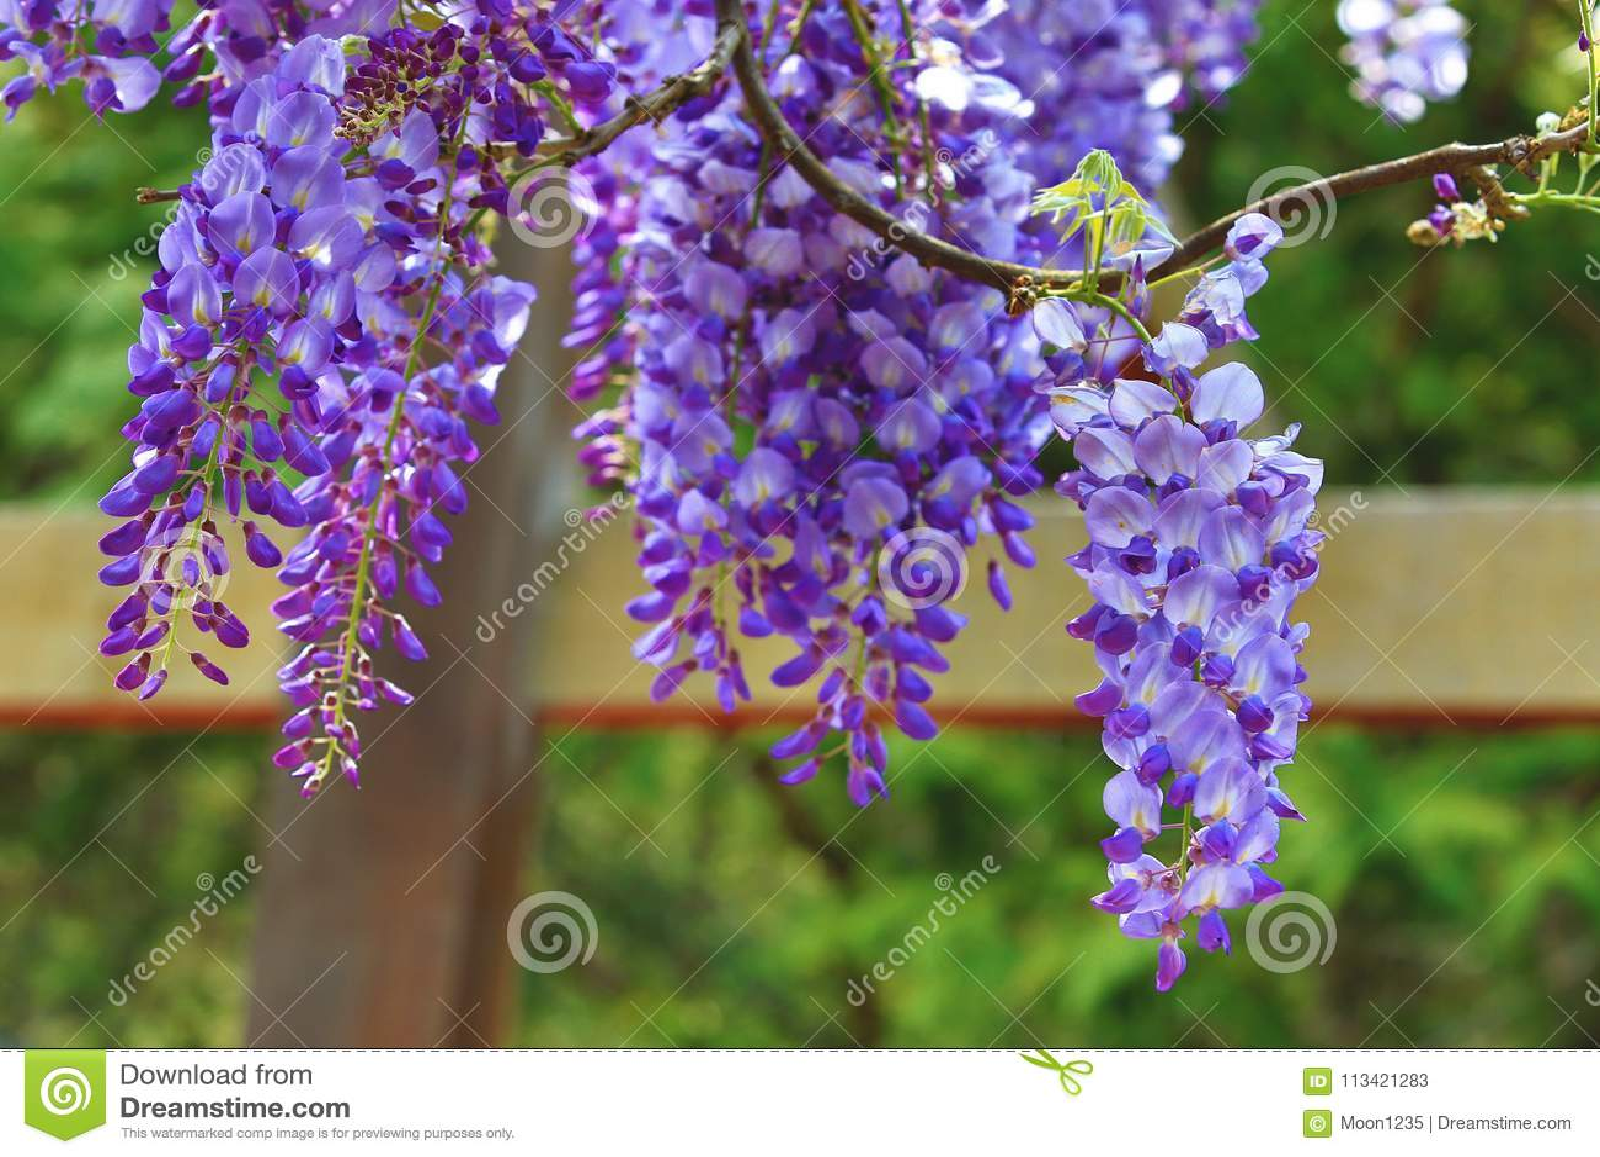 Purple wisteria flowersbean treechinese wisteriapurple vine stock download purple wisteria flowersbean treechinese wisteriapurple vine stock image mightylinksfo